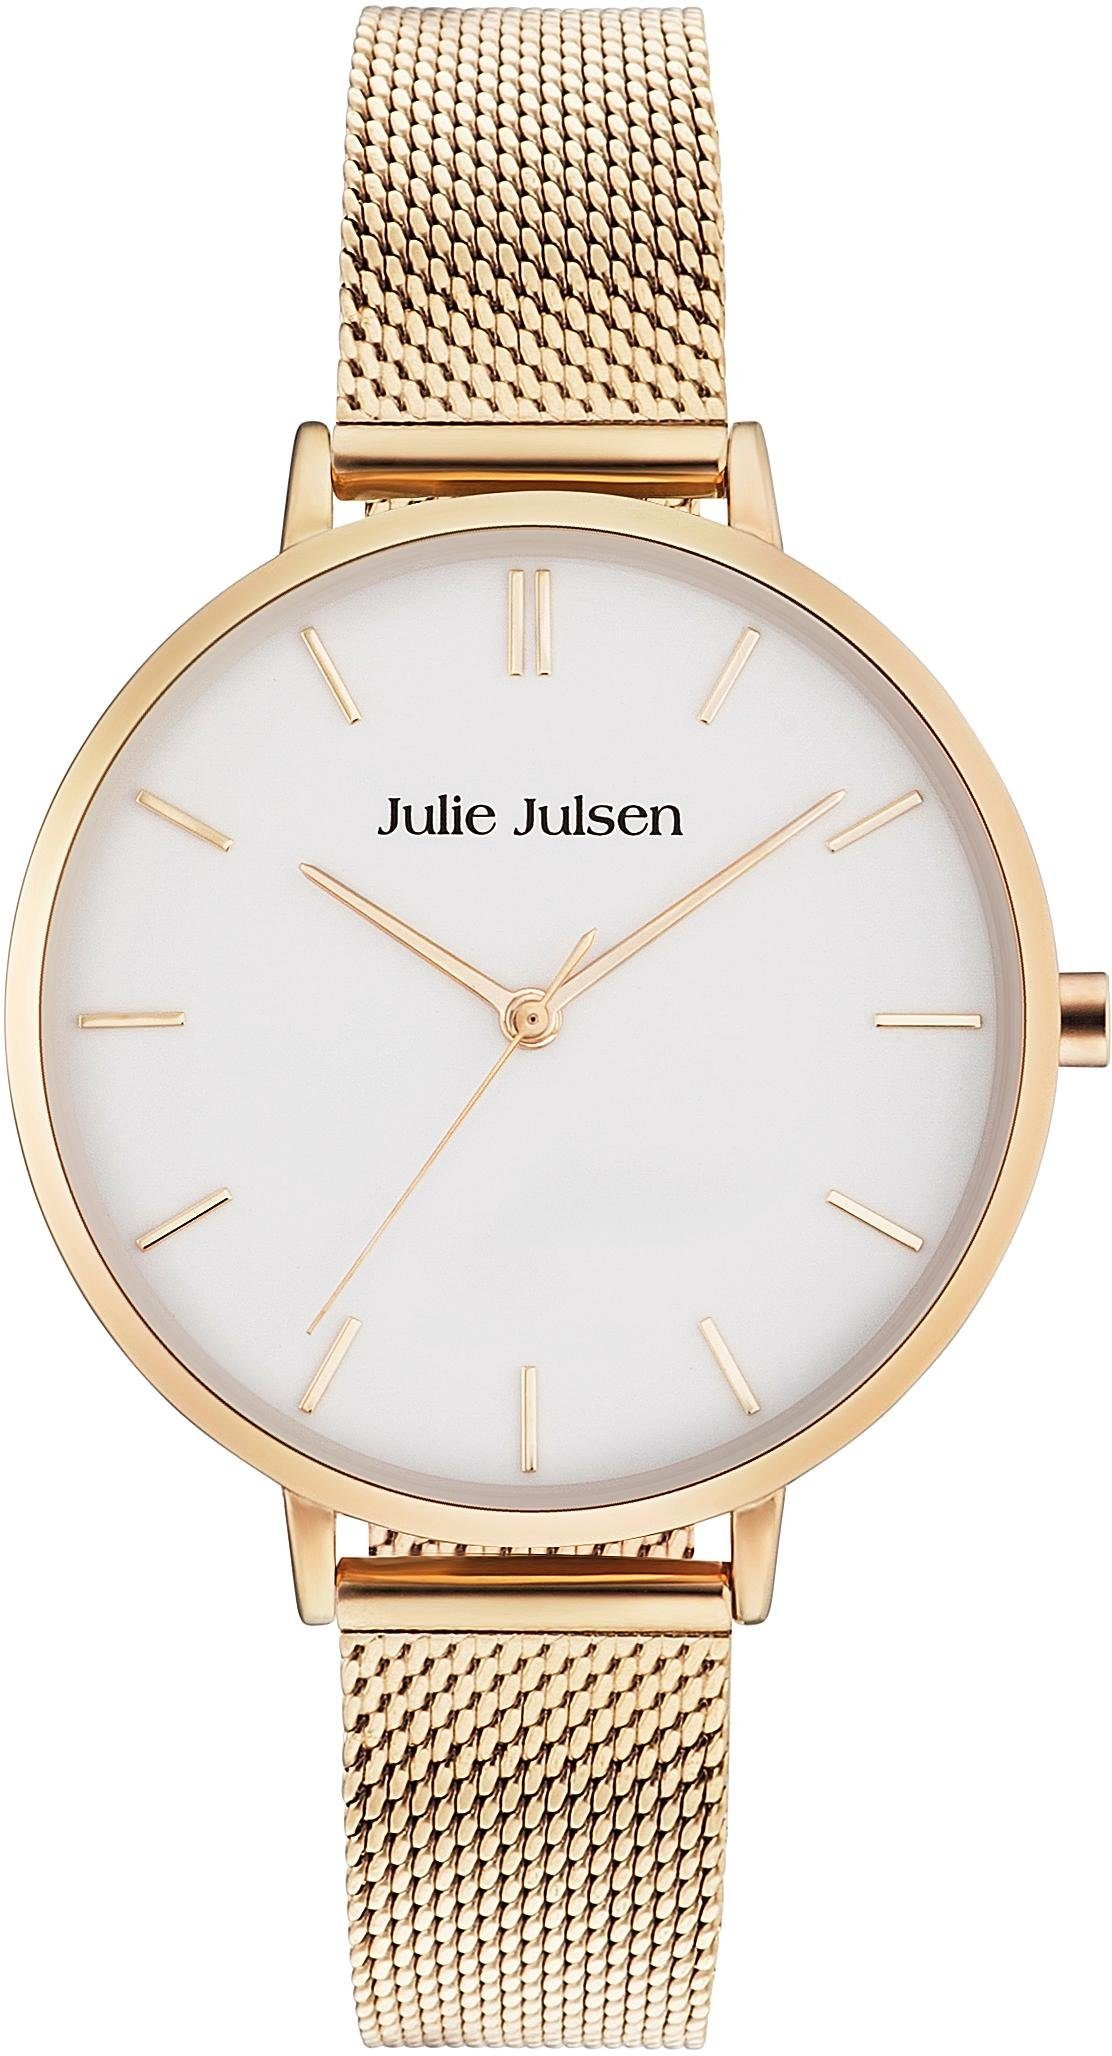 Julie Julsen Quarzuhr »Pure Gold Mesh, JJW10YGME«